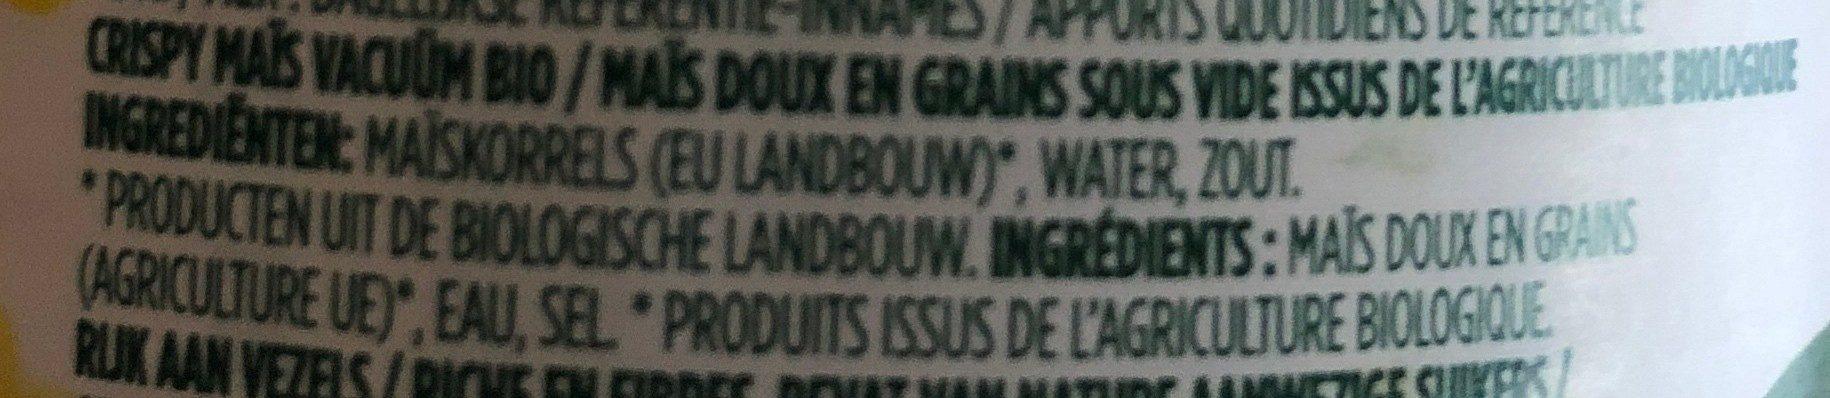 Maizbio - Ingredients